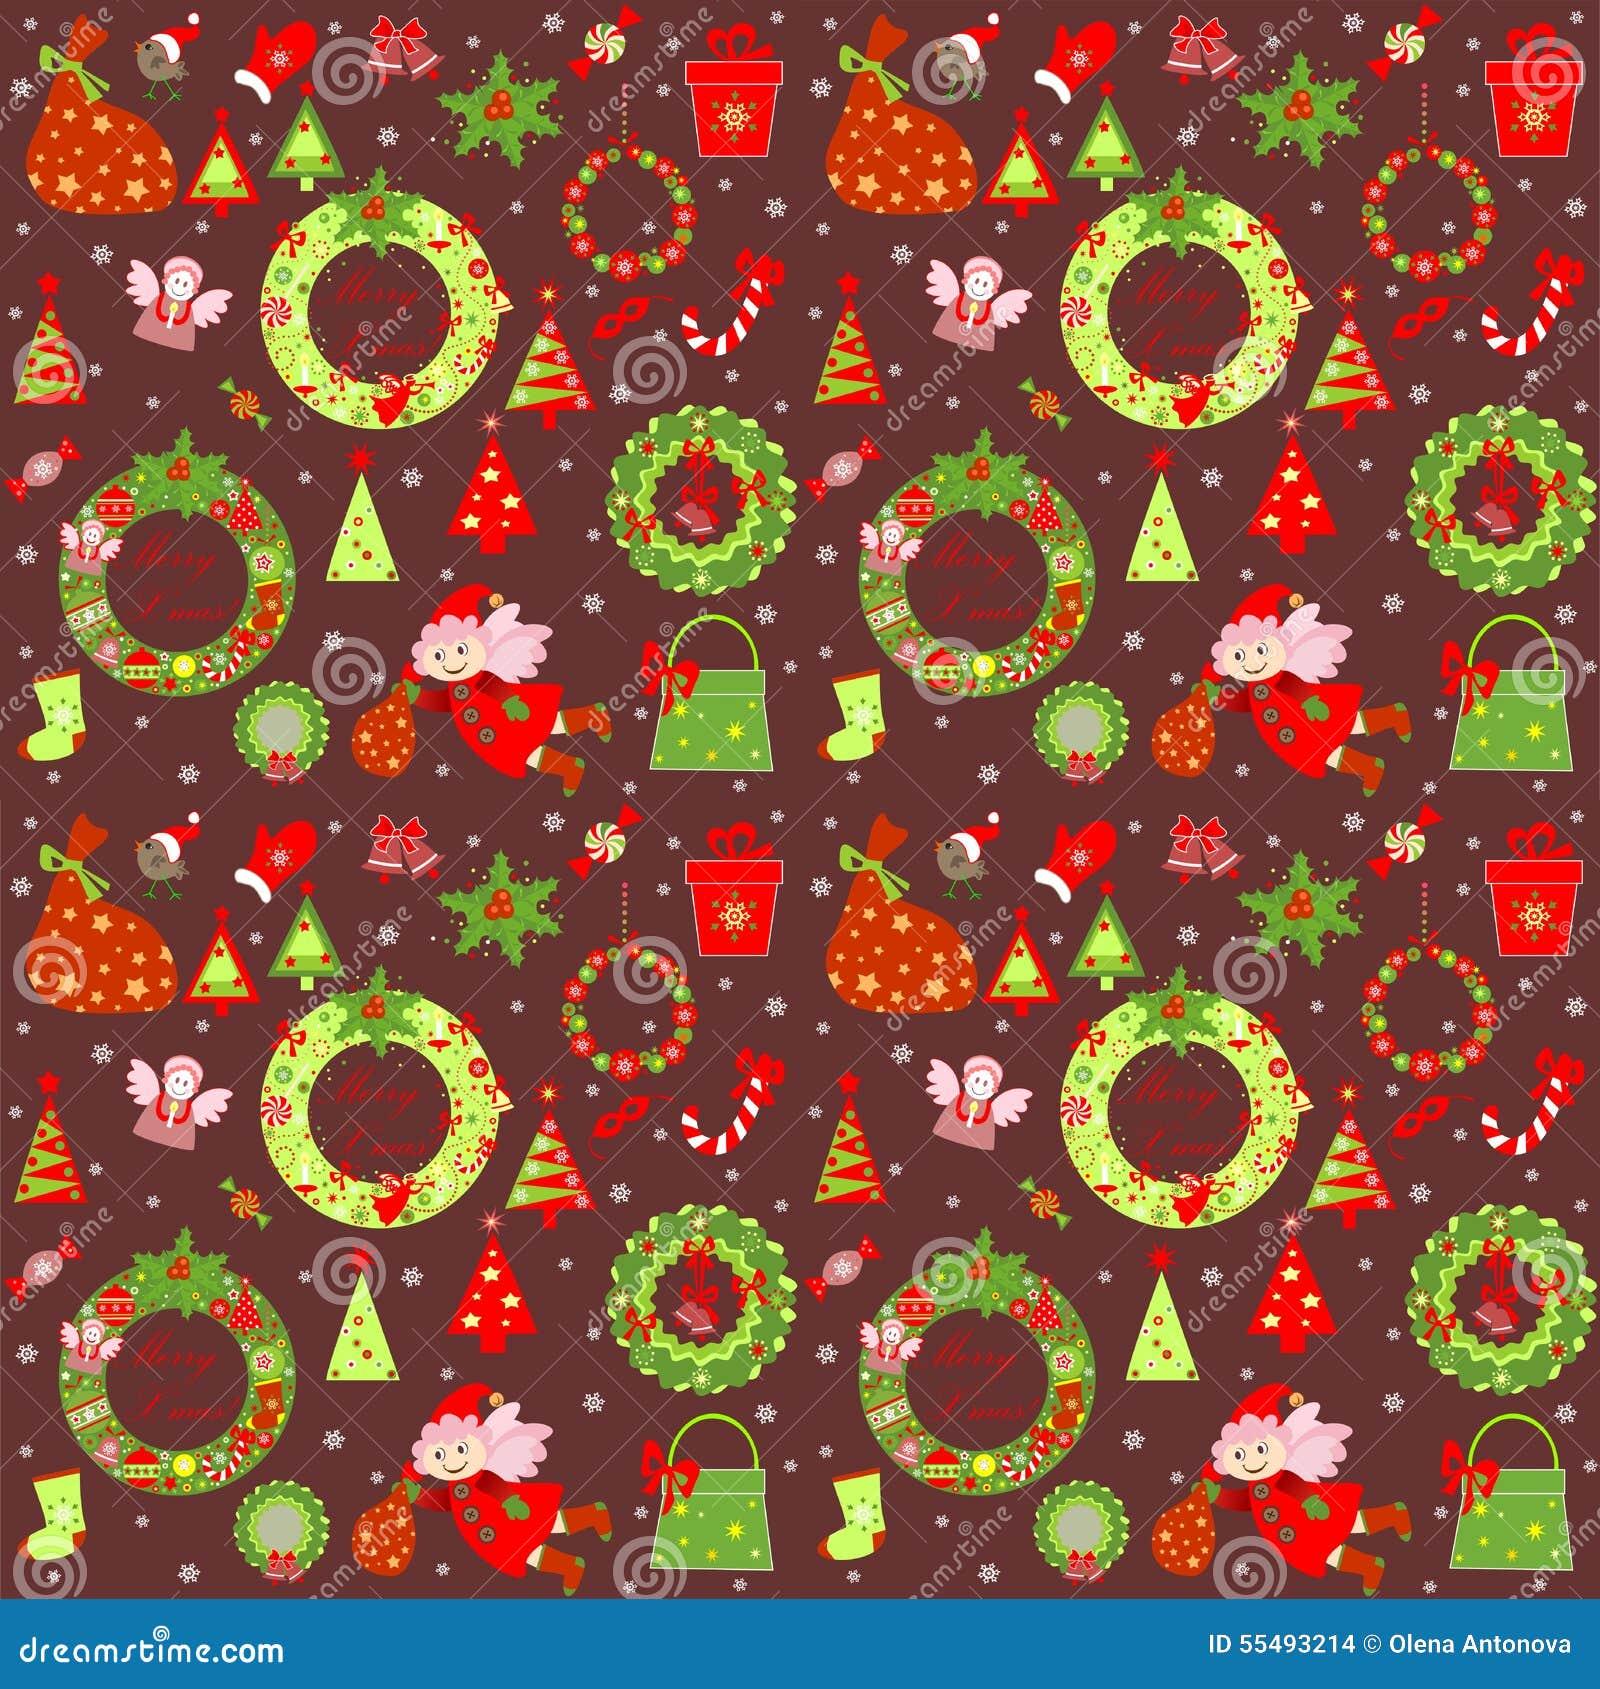 Christmas Retro Wallpaper Stock Vector. Illustration Of